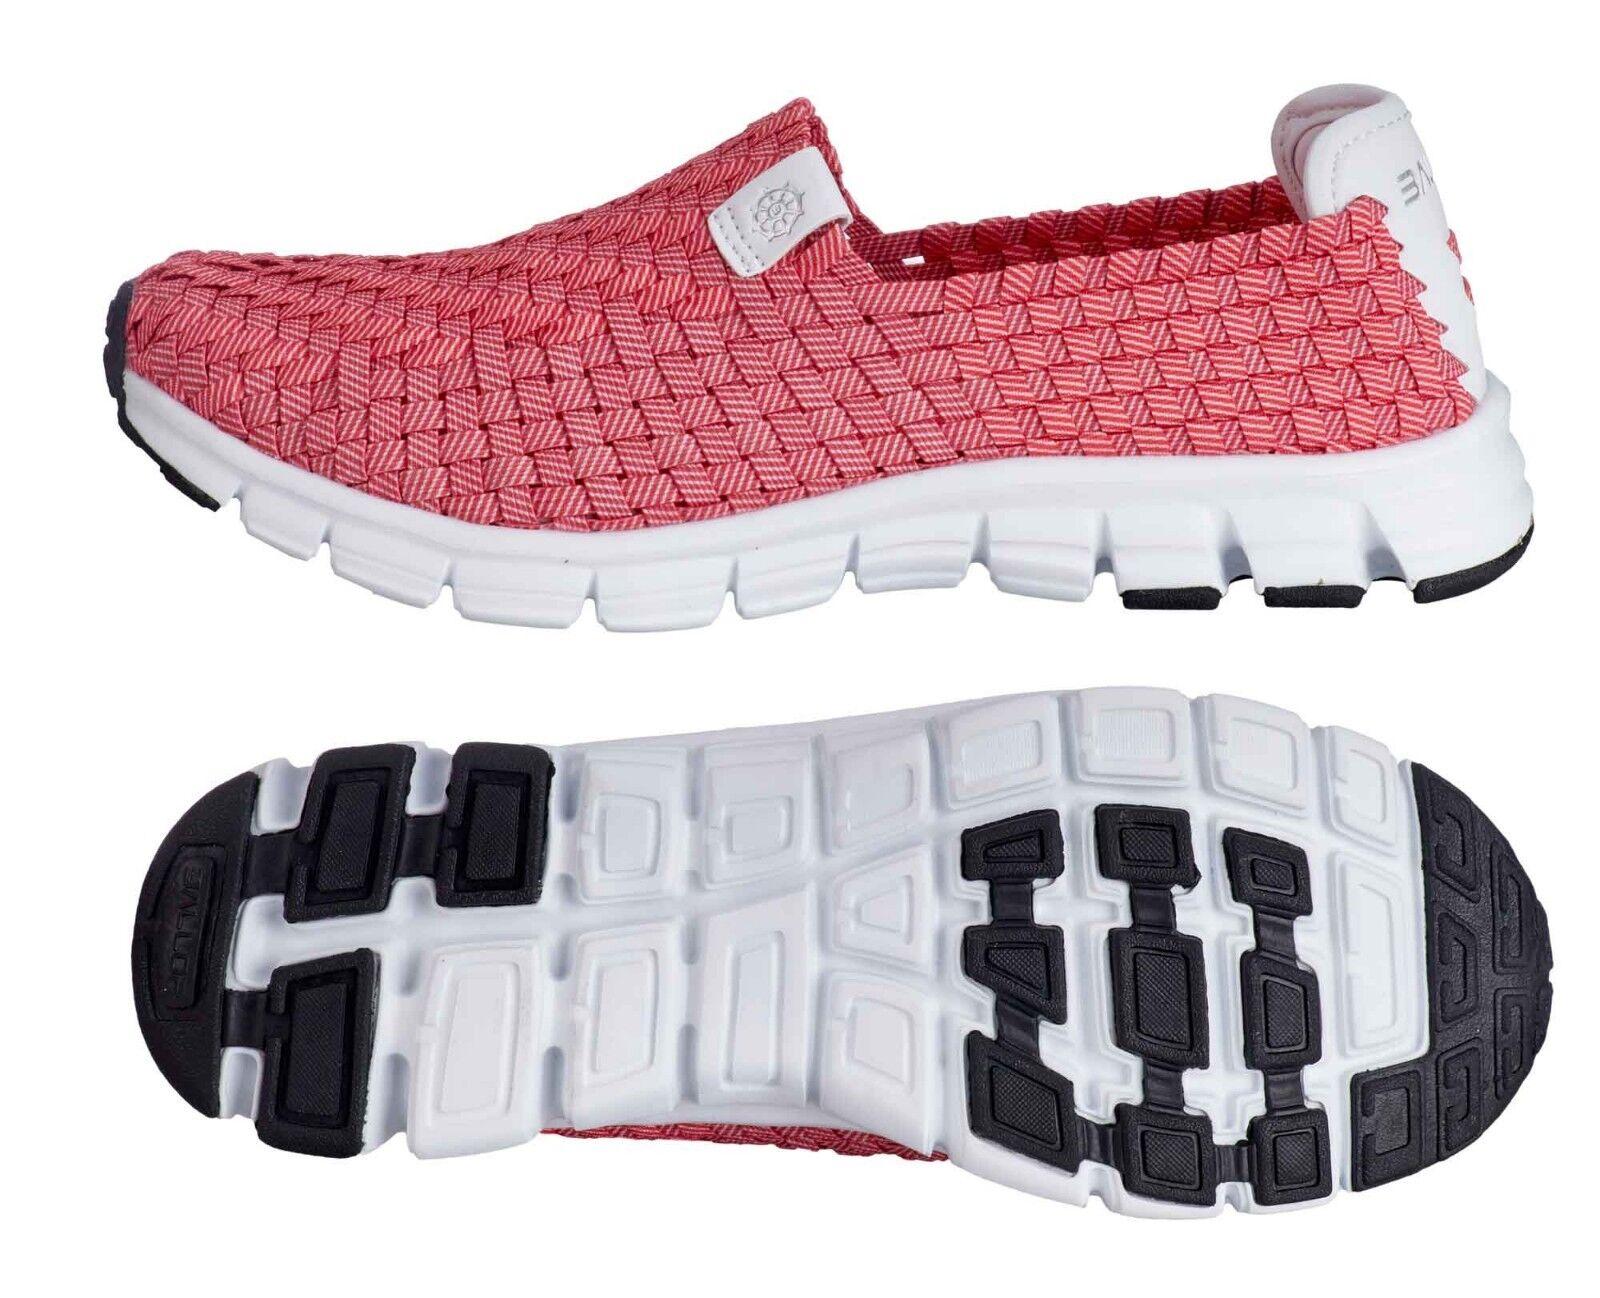 Ballop baskets  Aloha  Rouge-Basses-Chaussures de loisirs-Leisure Chaussure